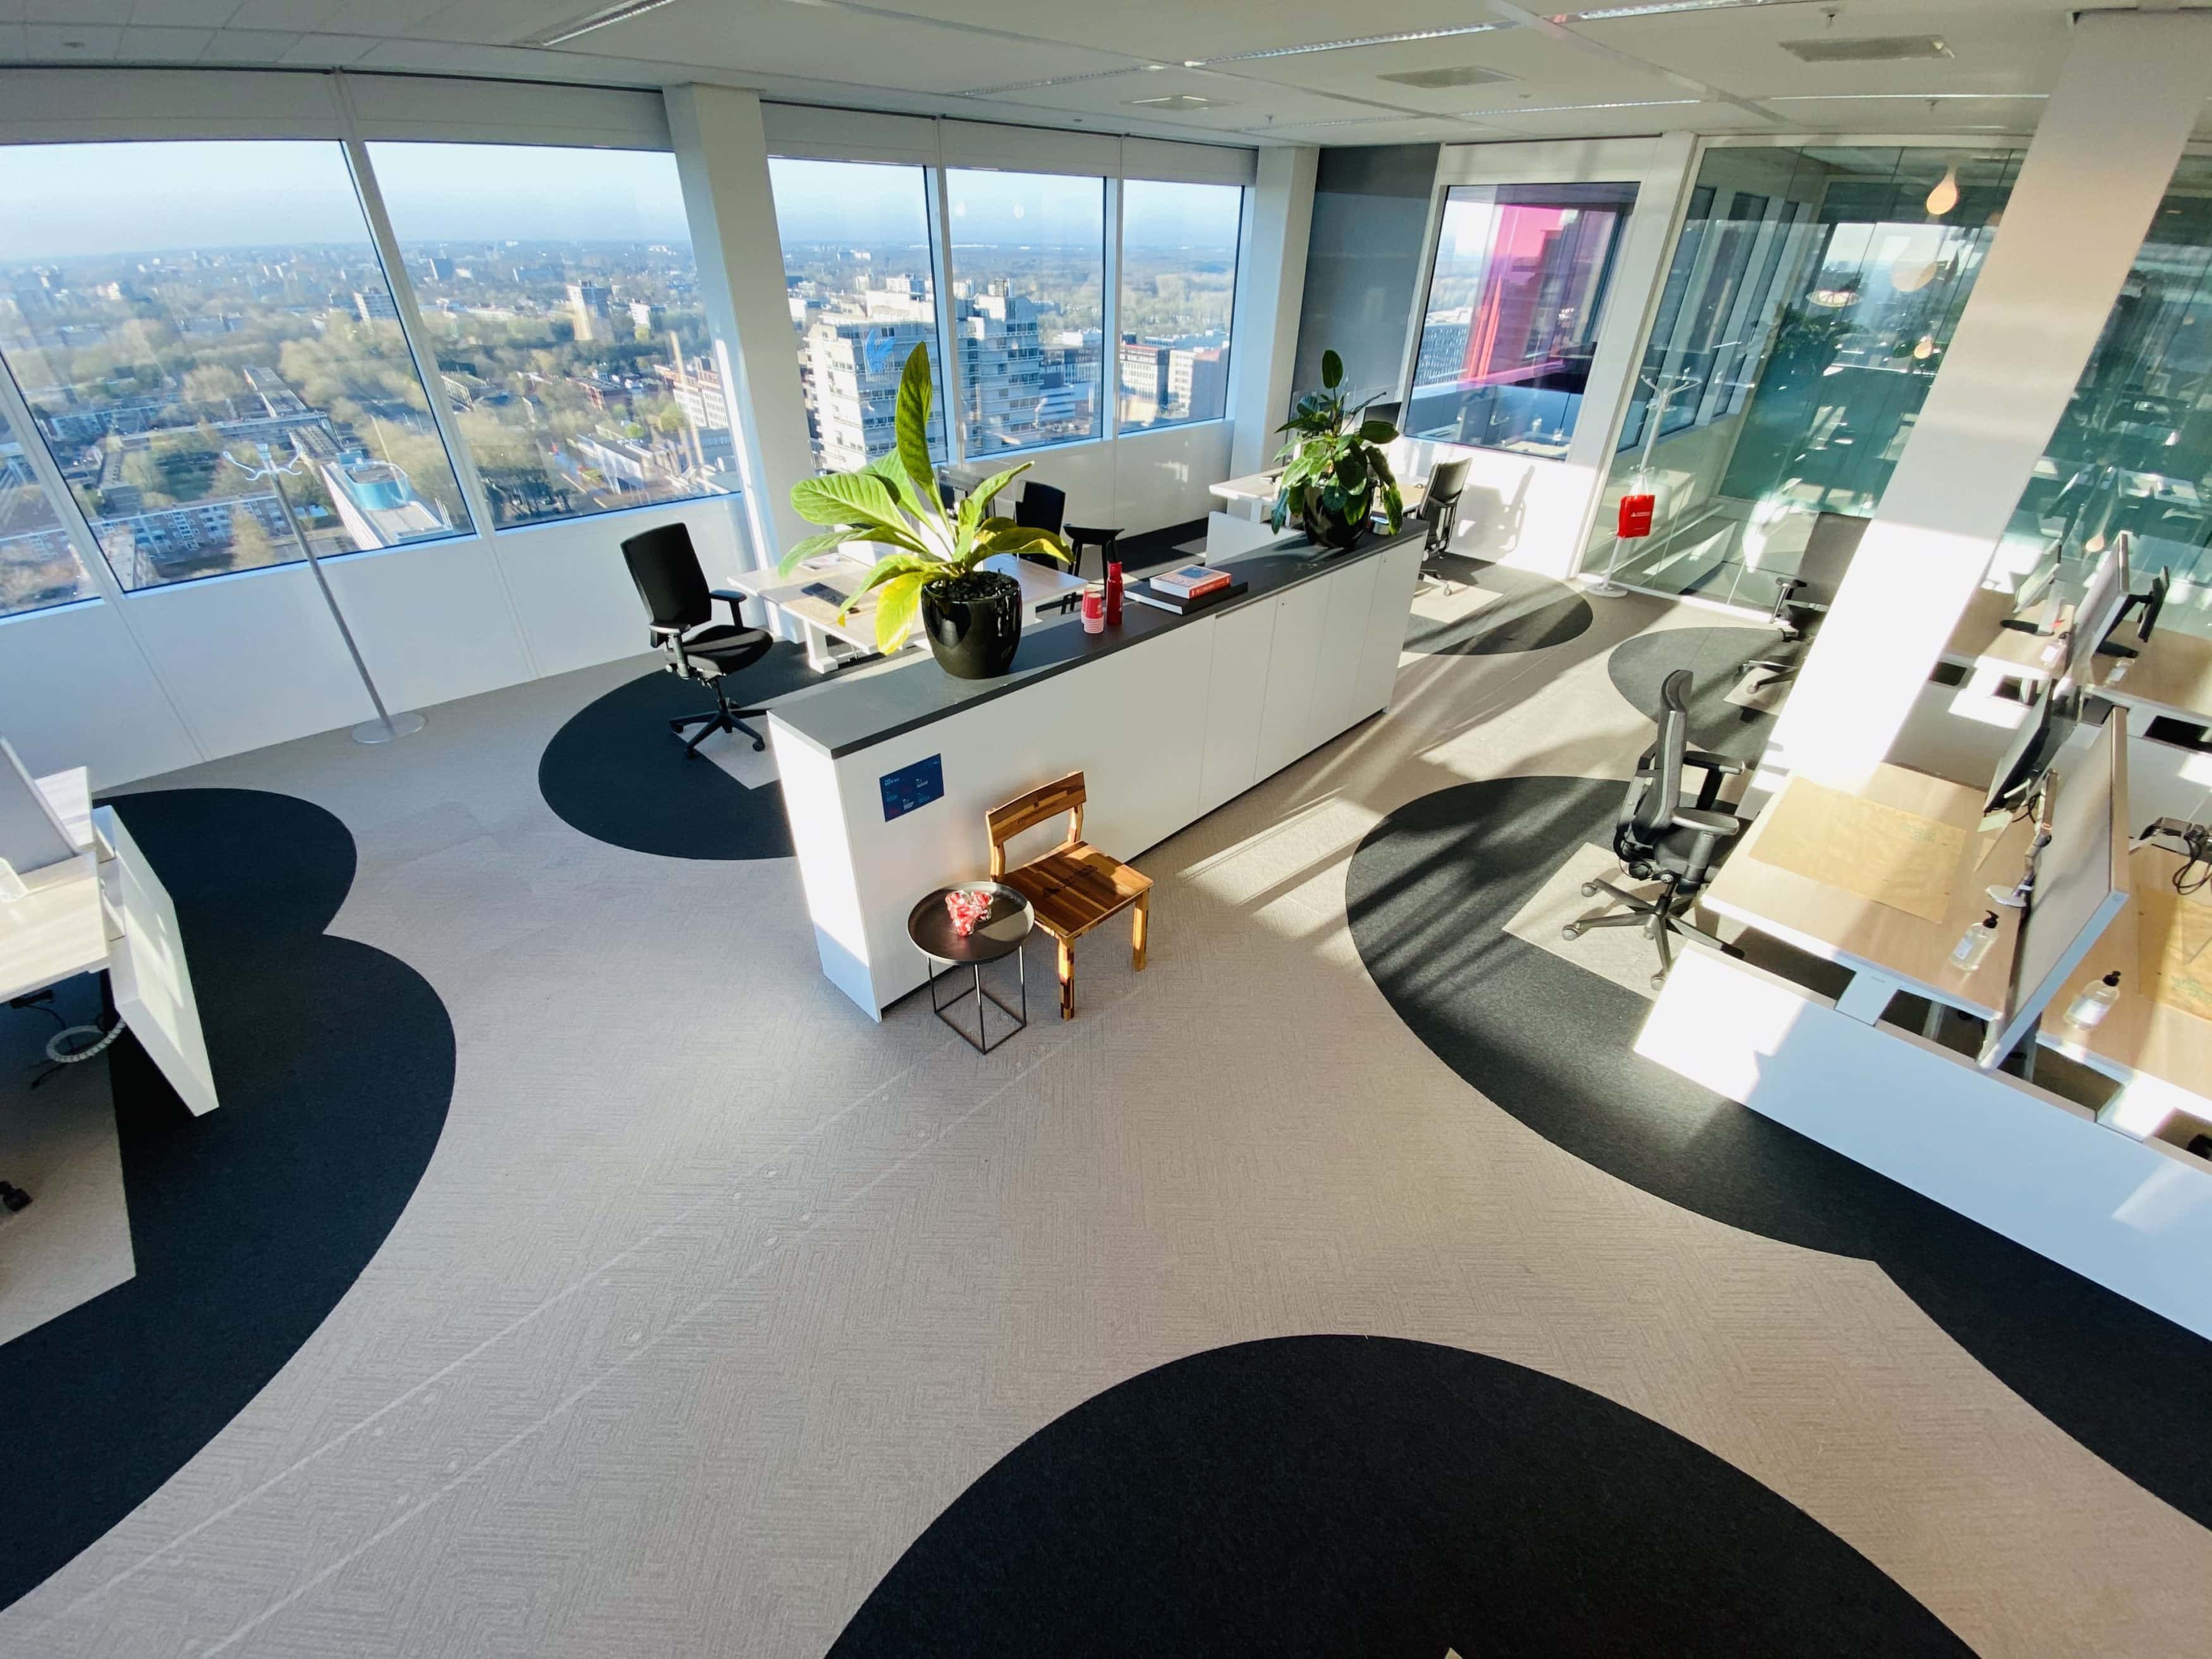 CW_six-feet-office_2-3500x2625.jpg